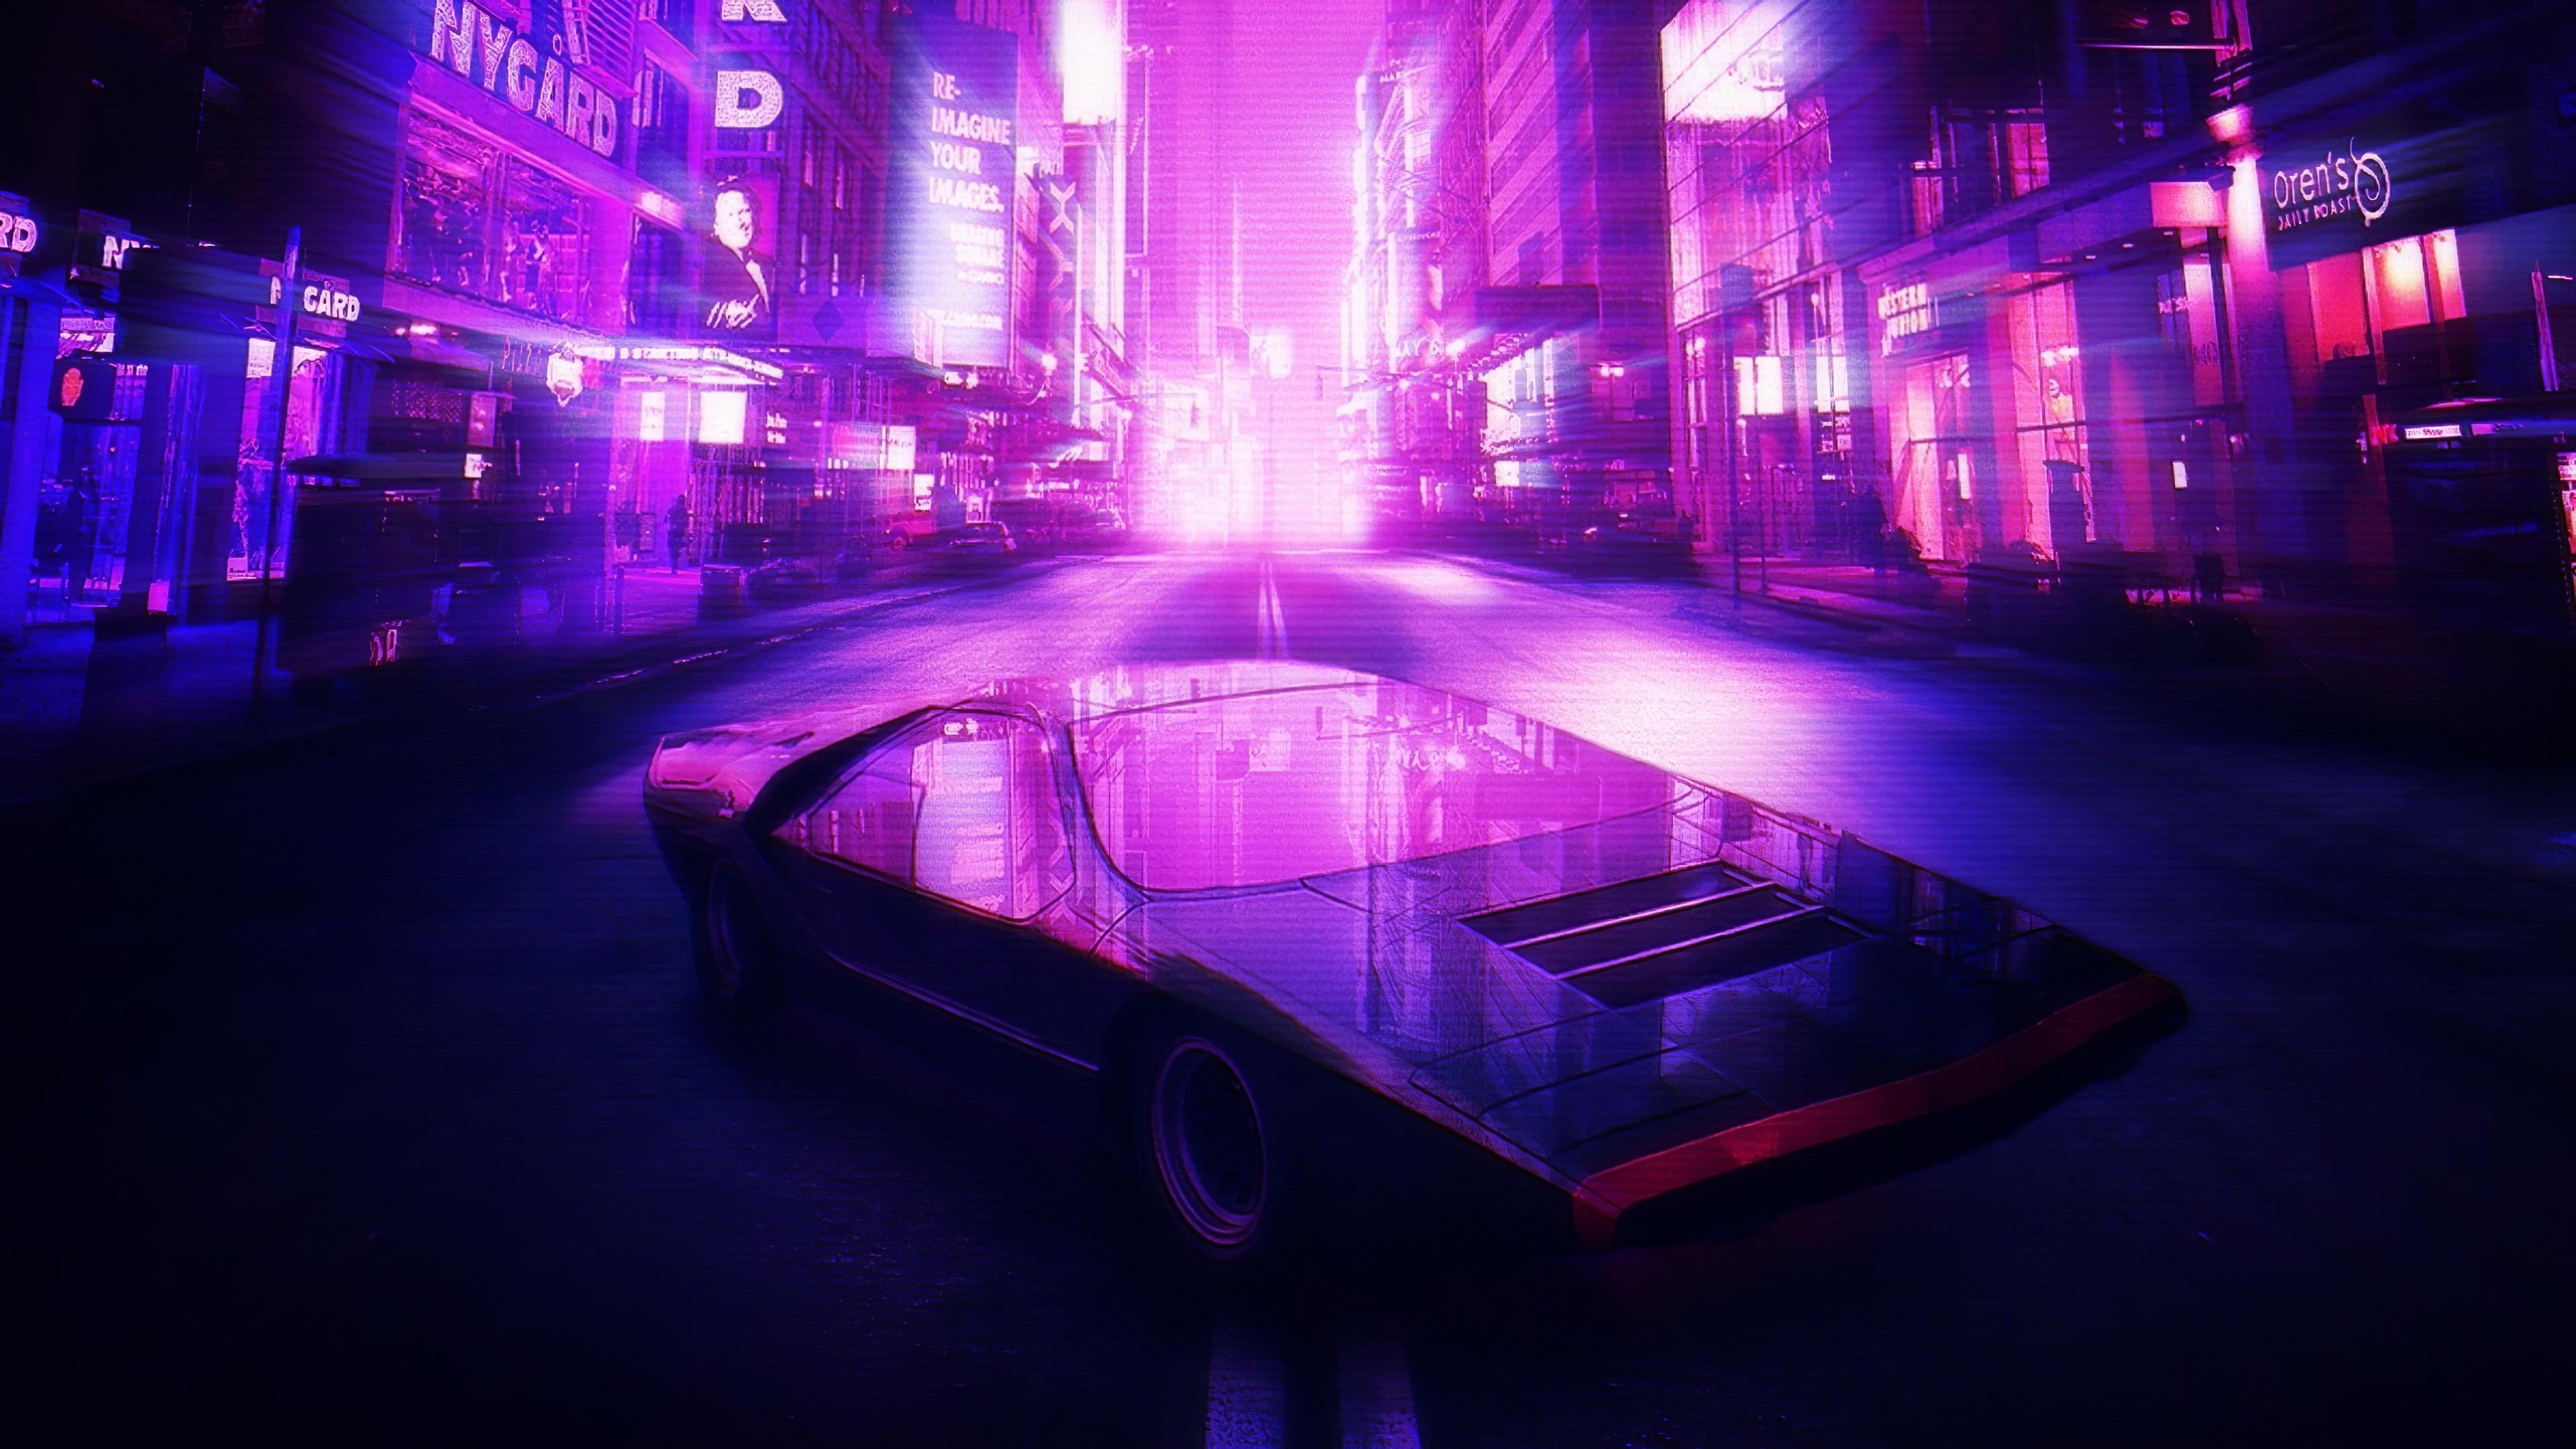 neon city car 1578255476 - Neon City Car -